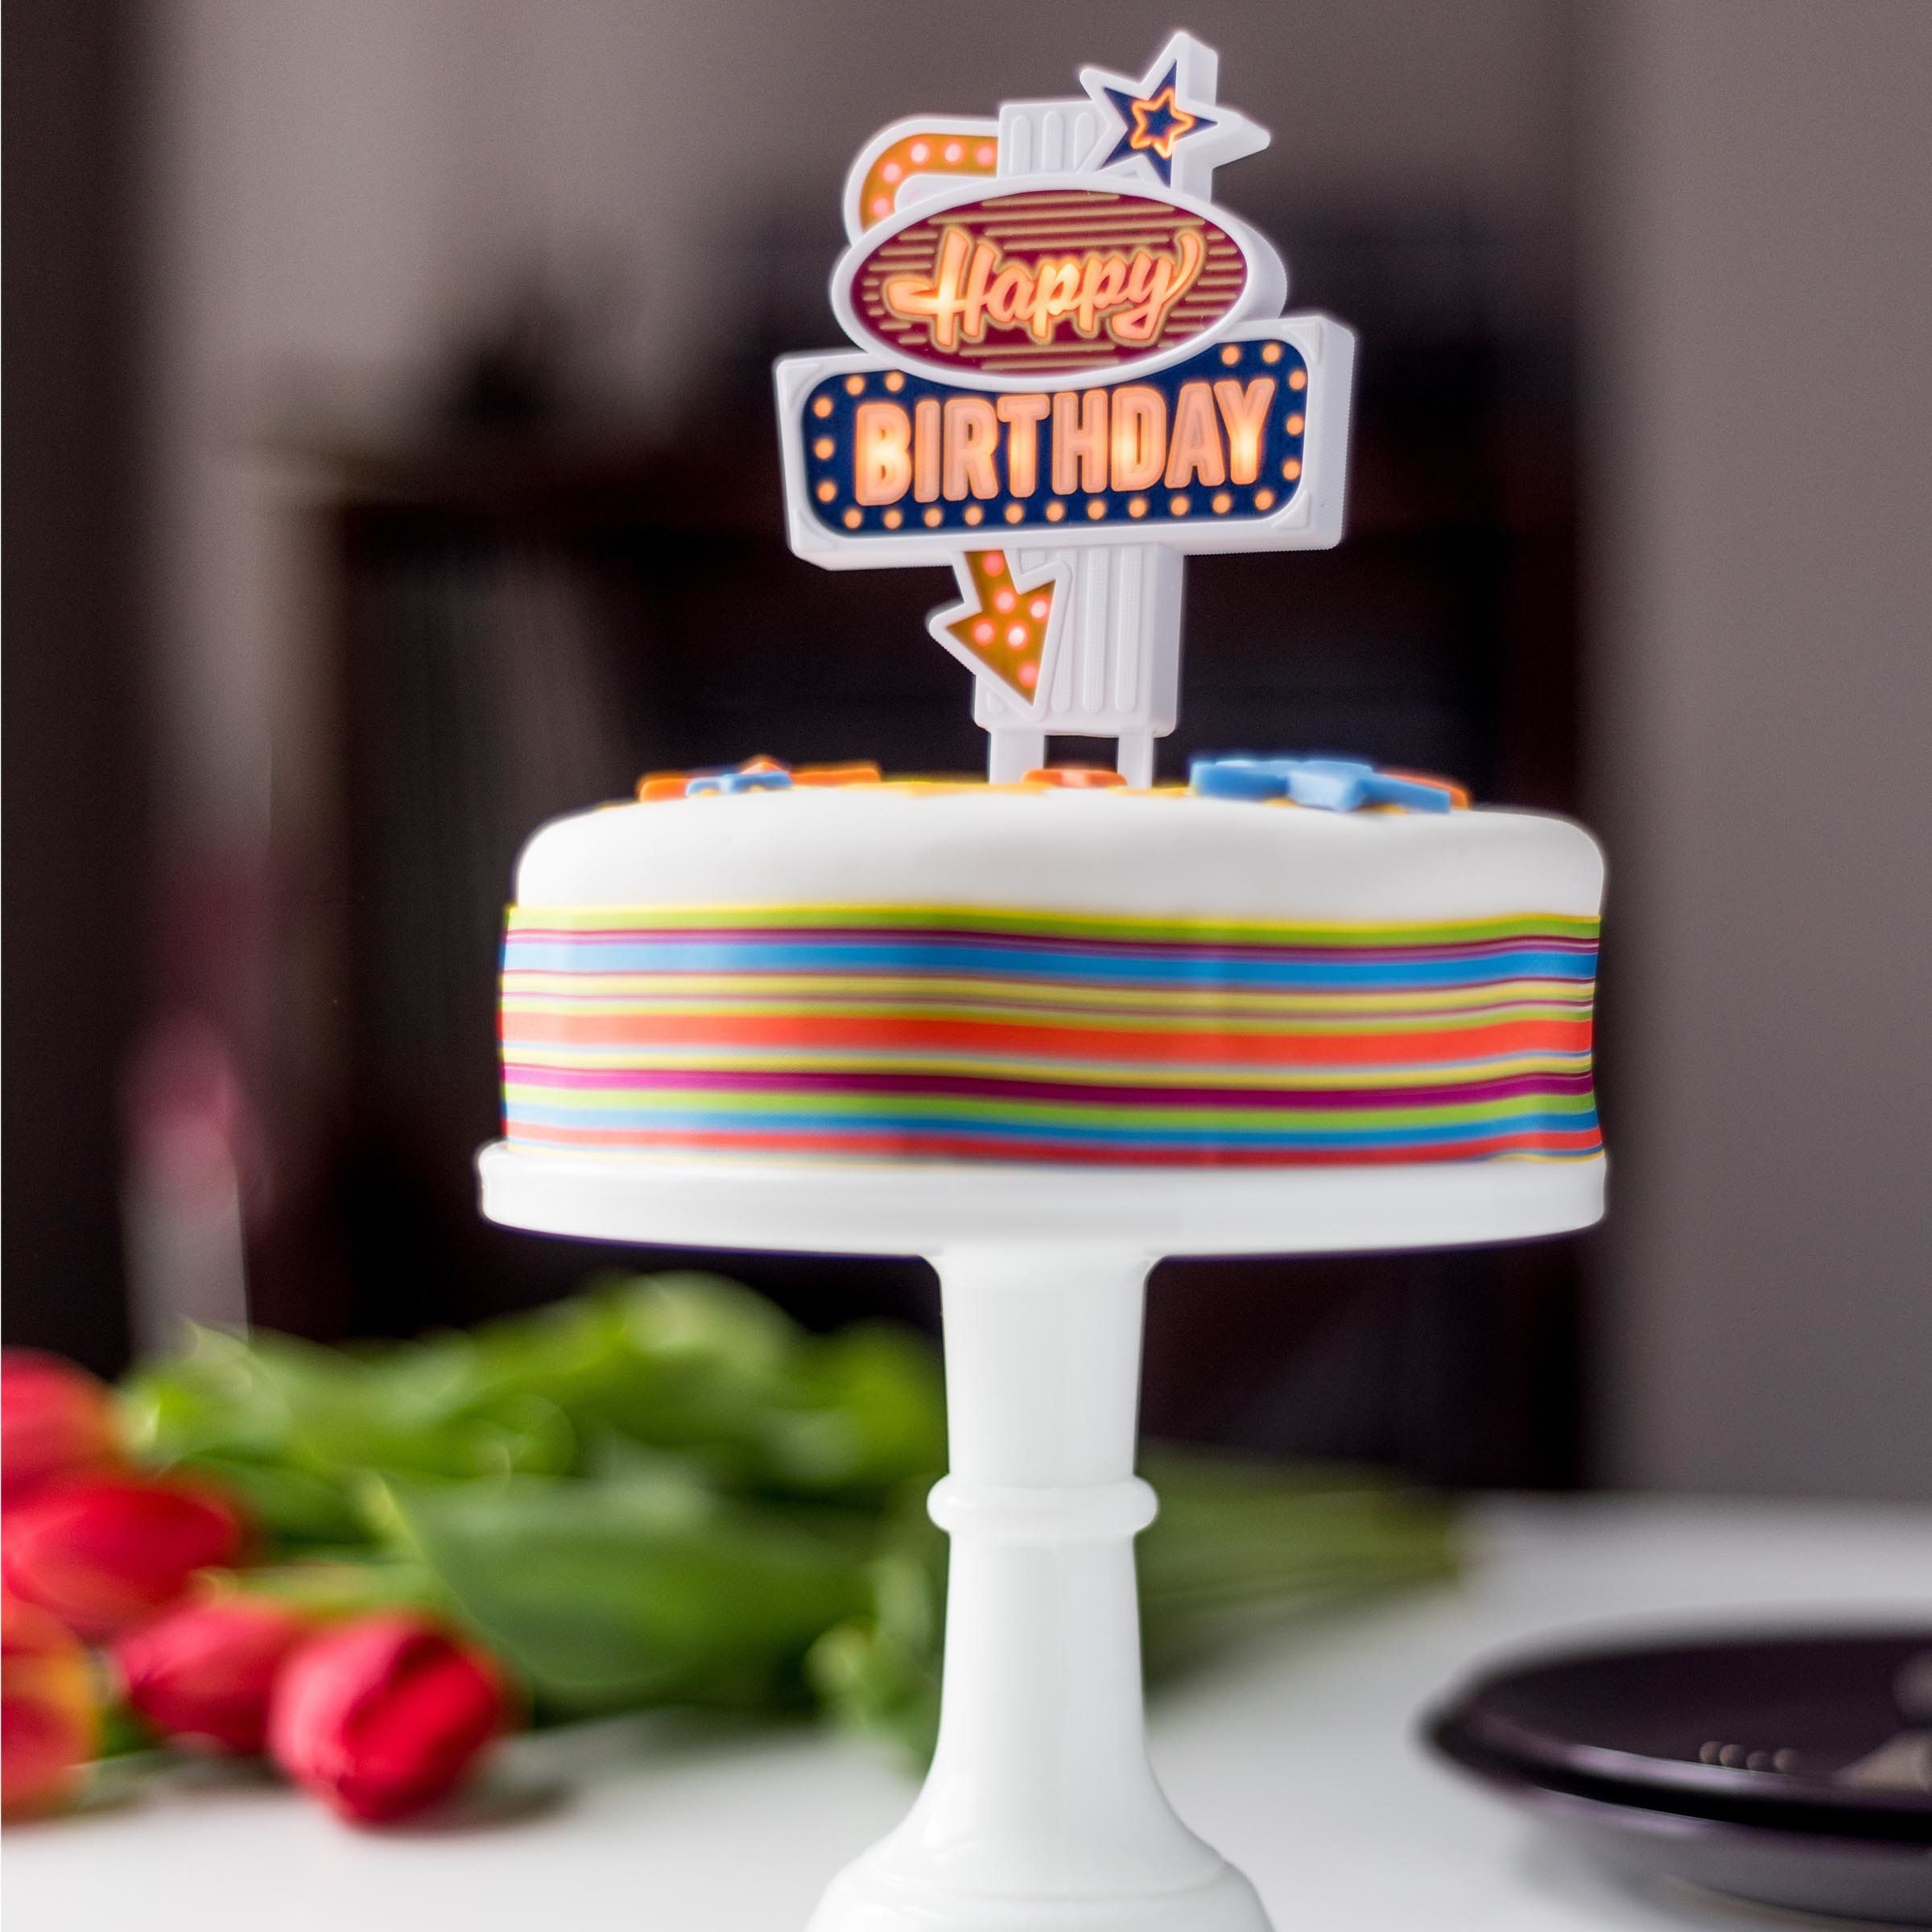 Phenomenal New 2020 Light Up Happy Birthday Cake Toppers Novelty Retro Uk Personalised Birthday Cards Paralily Jamesorg